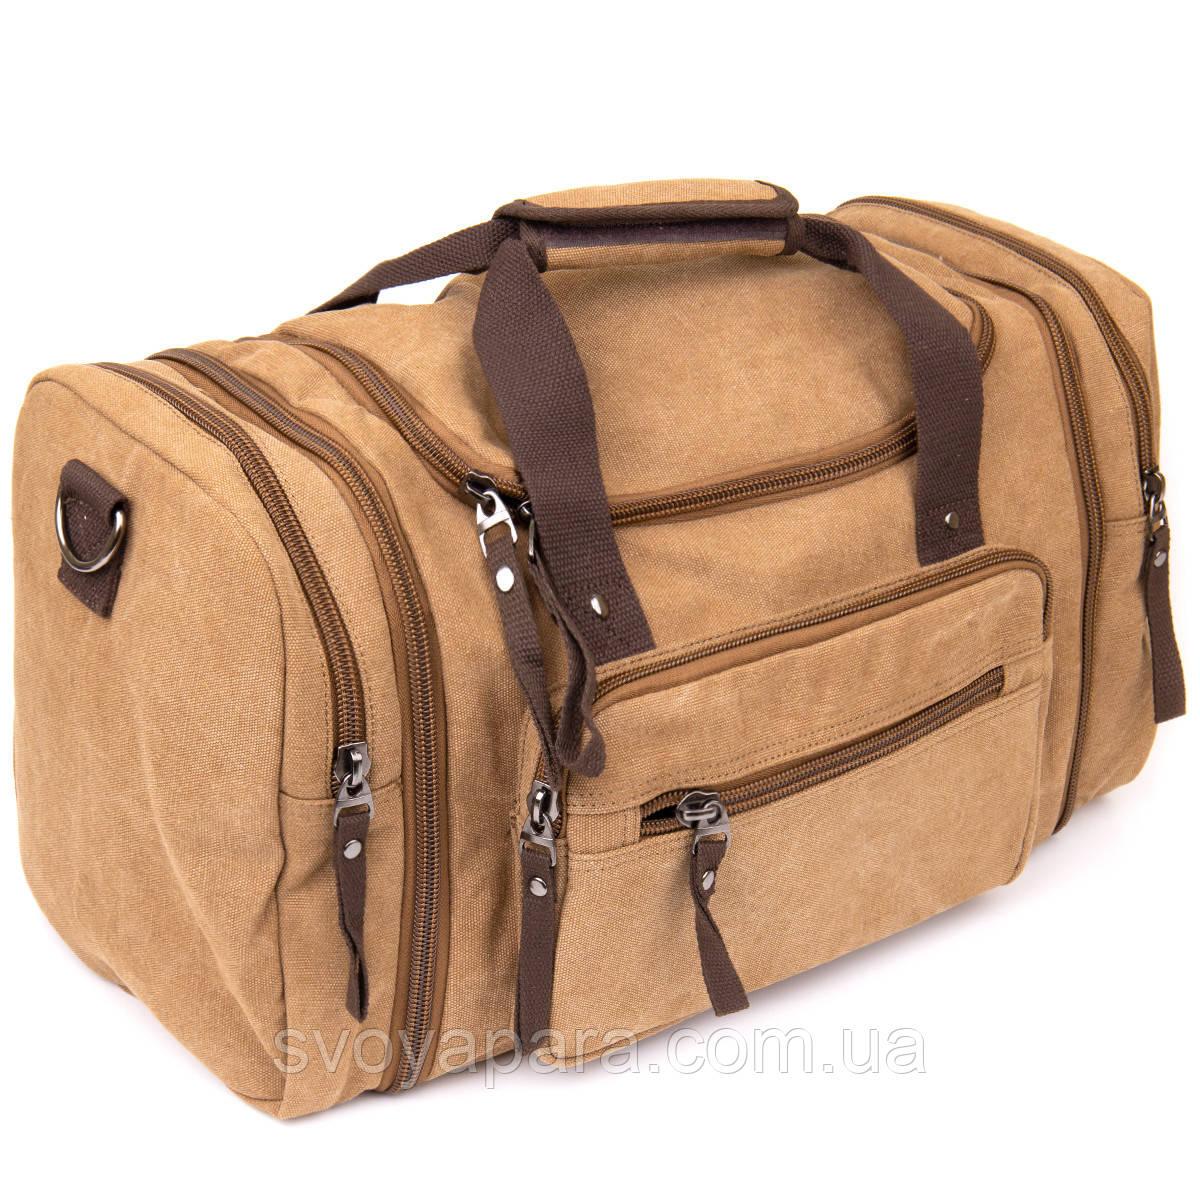 Дорожня сумка текстильна Vintage 20666 Коричнева